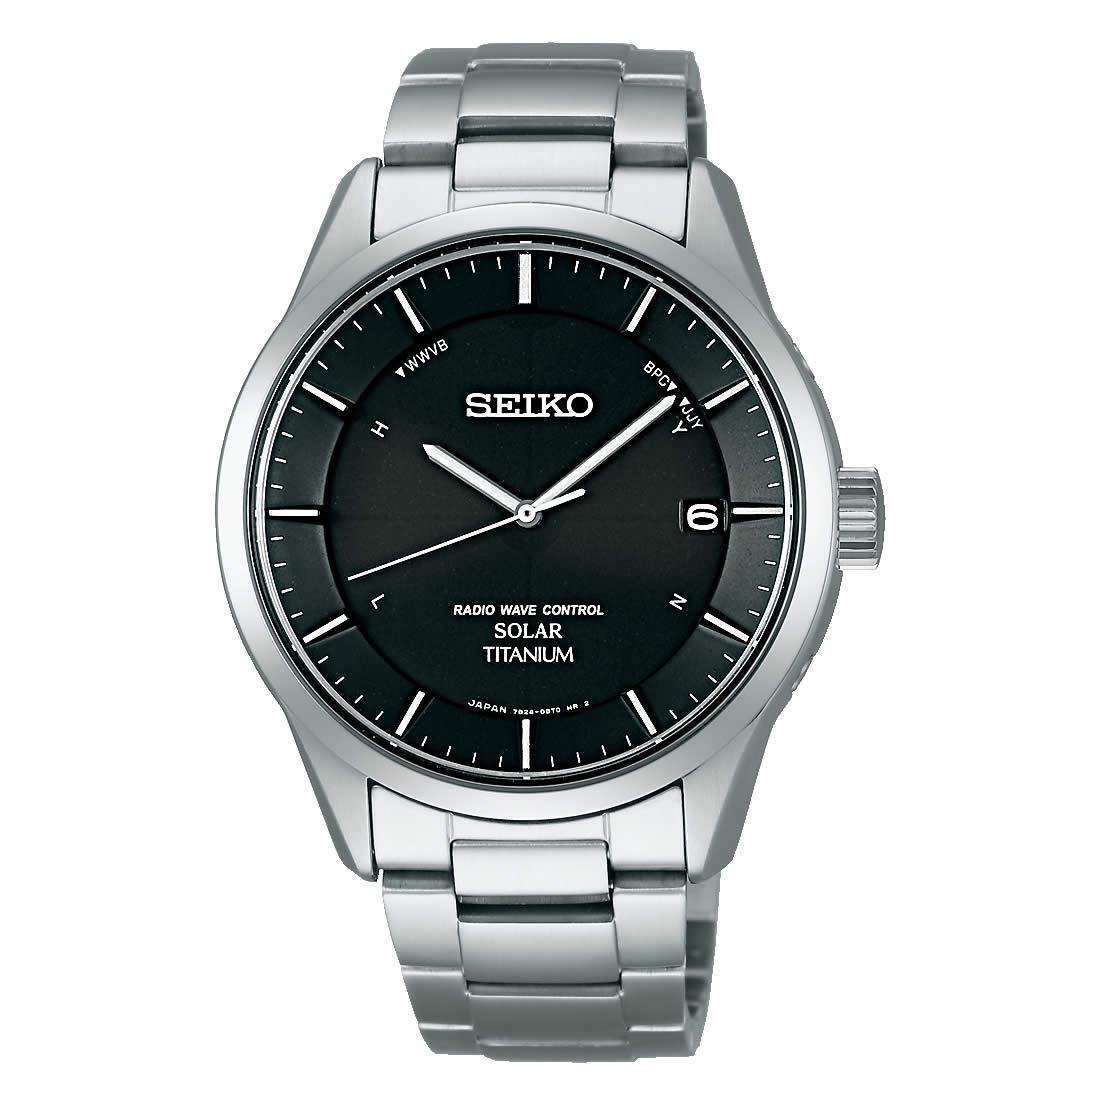 0b30da128d セイコー スピリット SEIKO SPIRIT 腕時計 ソーラー 電波 チタン メンズ SBTM211 電池交換不要. 100M 10気圧防水  ビジネス シンプル 電波ソーラー ソーラー電波 金属 ...